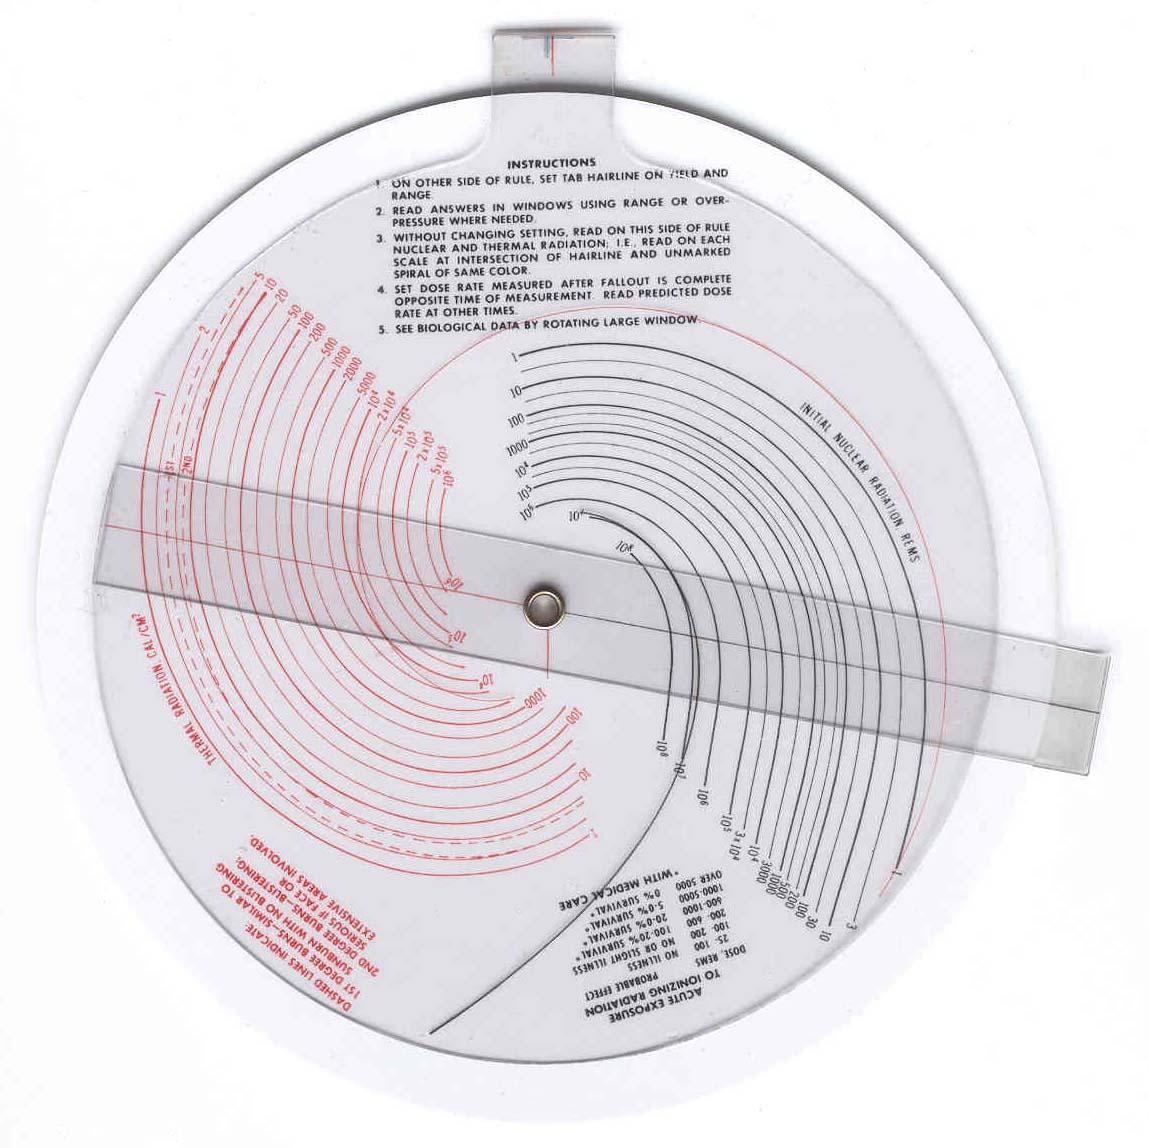 regle-circulaire-radioactivite-05